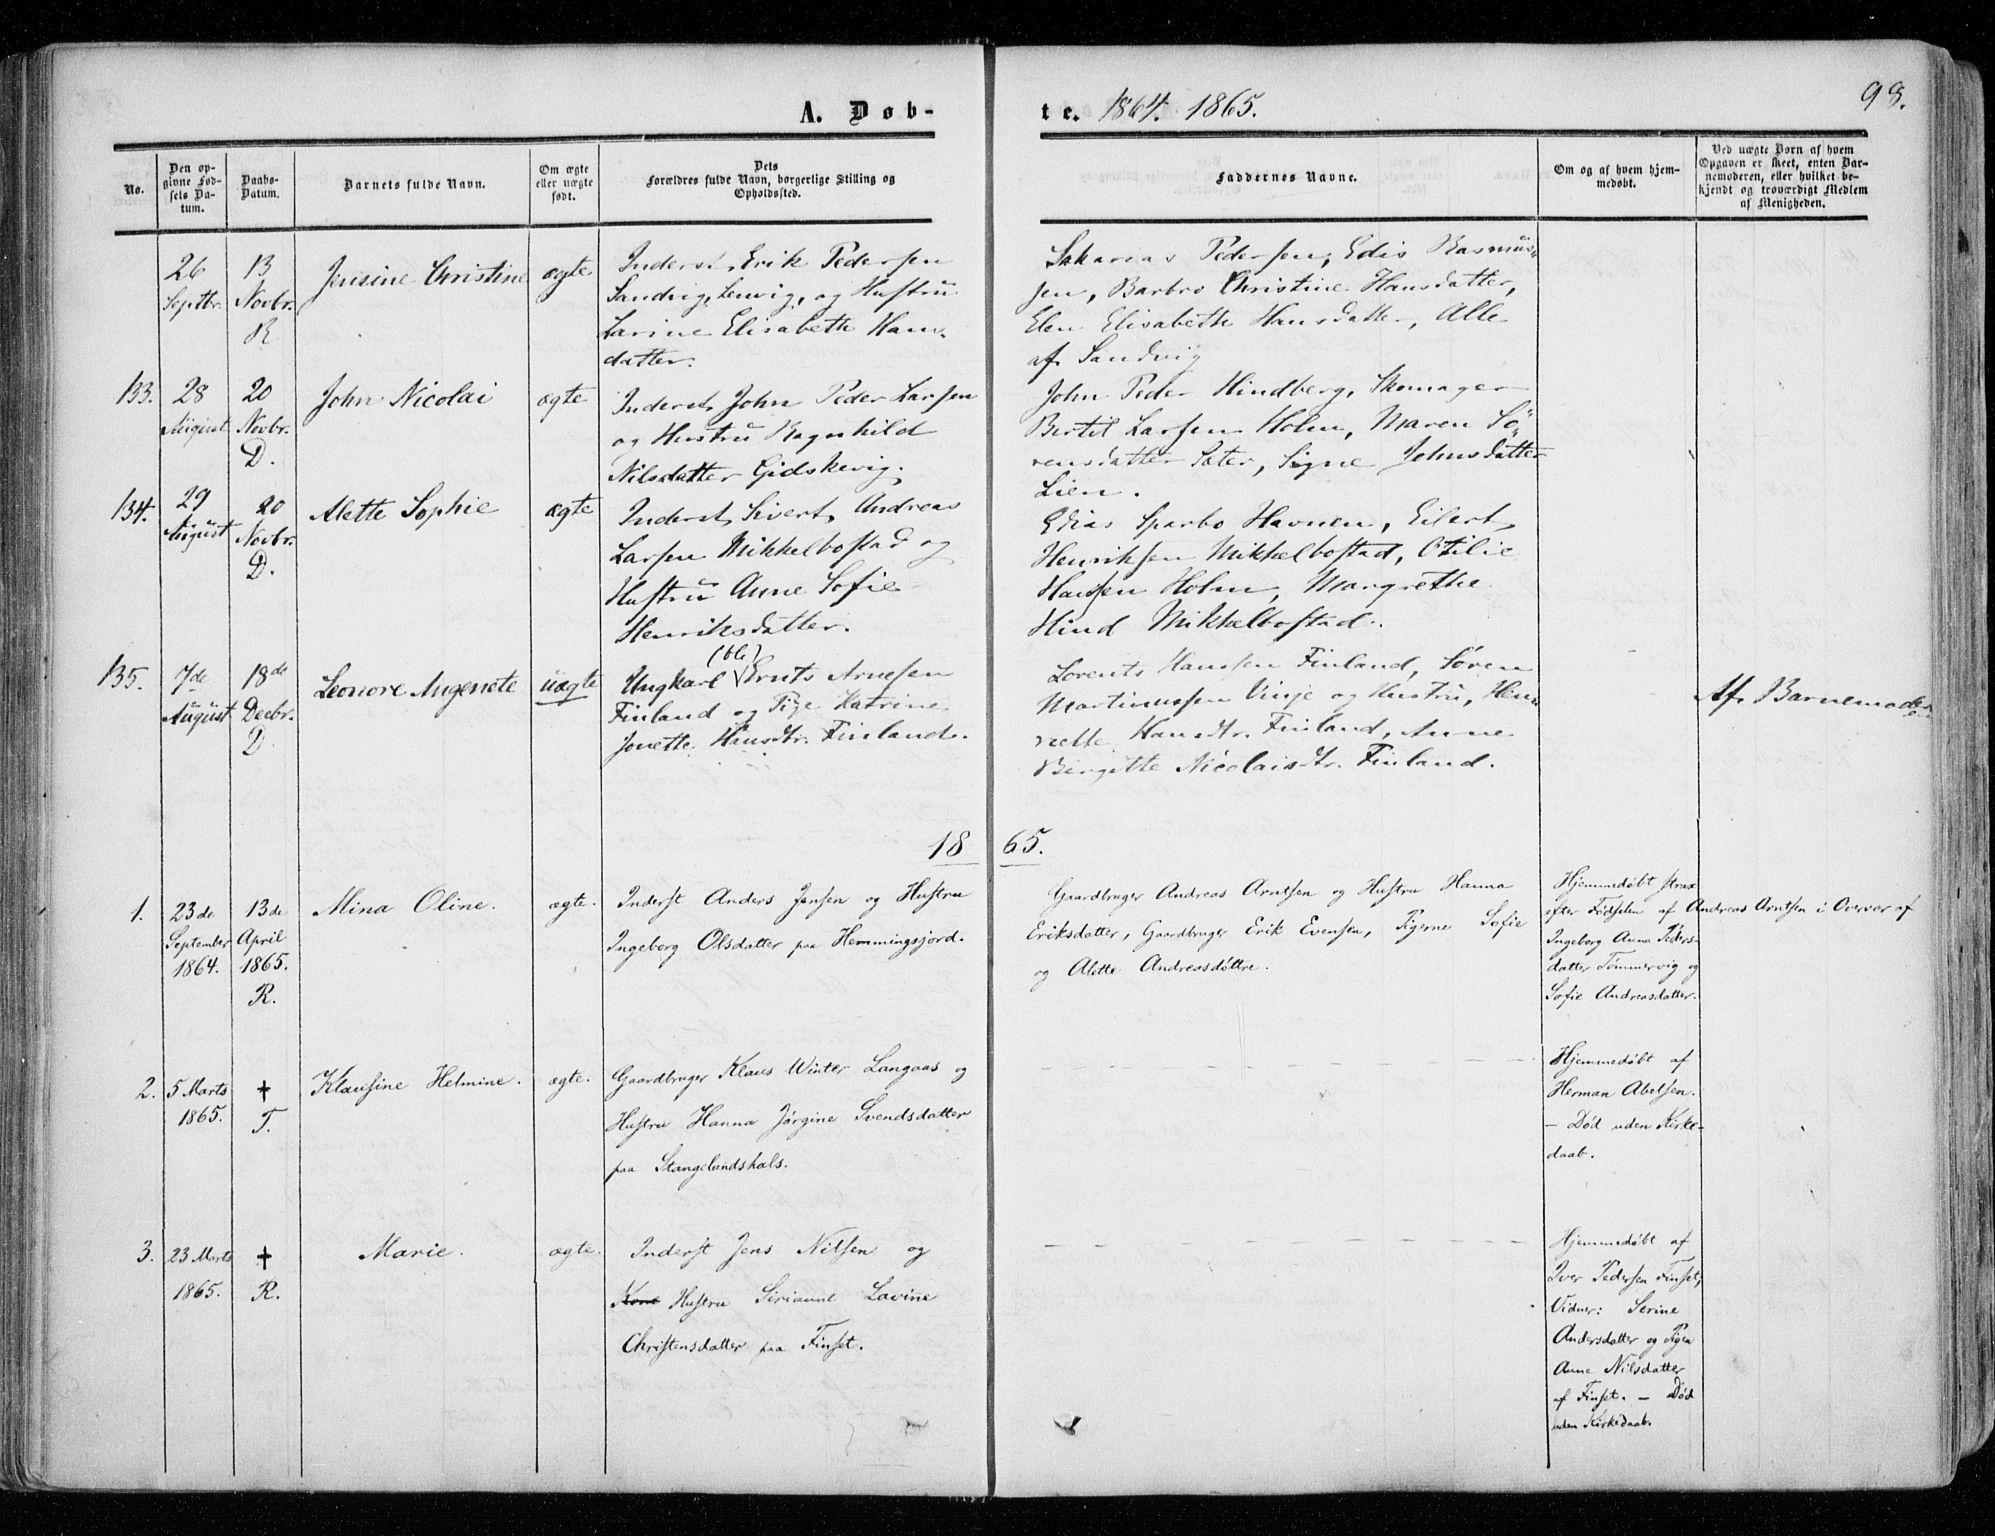 SATØ, Tranøy sokneprestkontor, I/Ia/Iaa/L0007kirke: Ministerialbok nr. 7, 1856-1866, s. 98